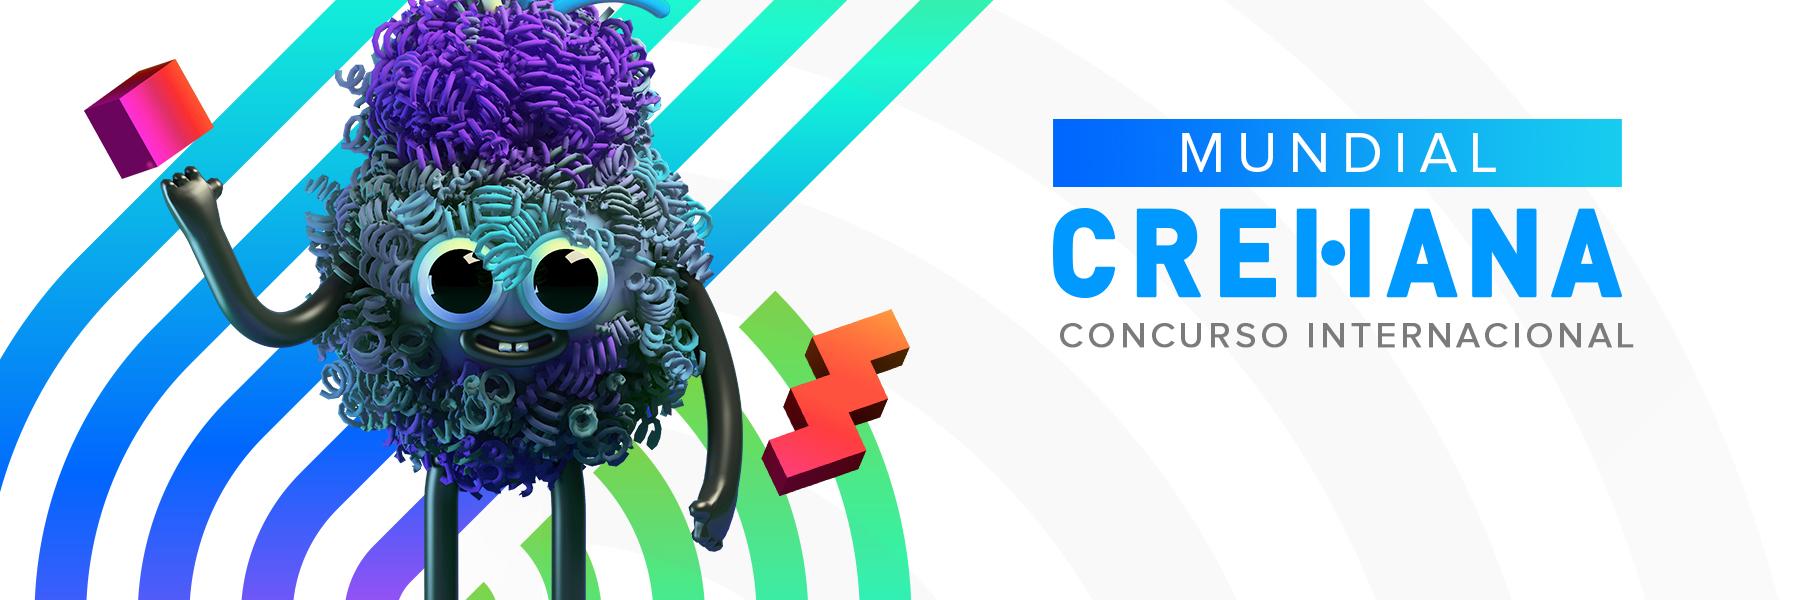 ¡Empezó el #MundialCrehana! Participa y llévate la Copa Creativa